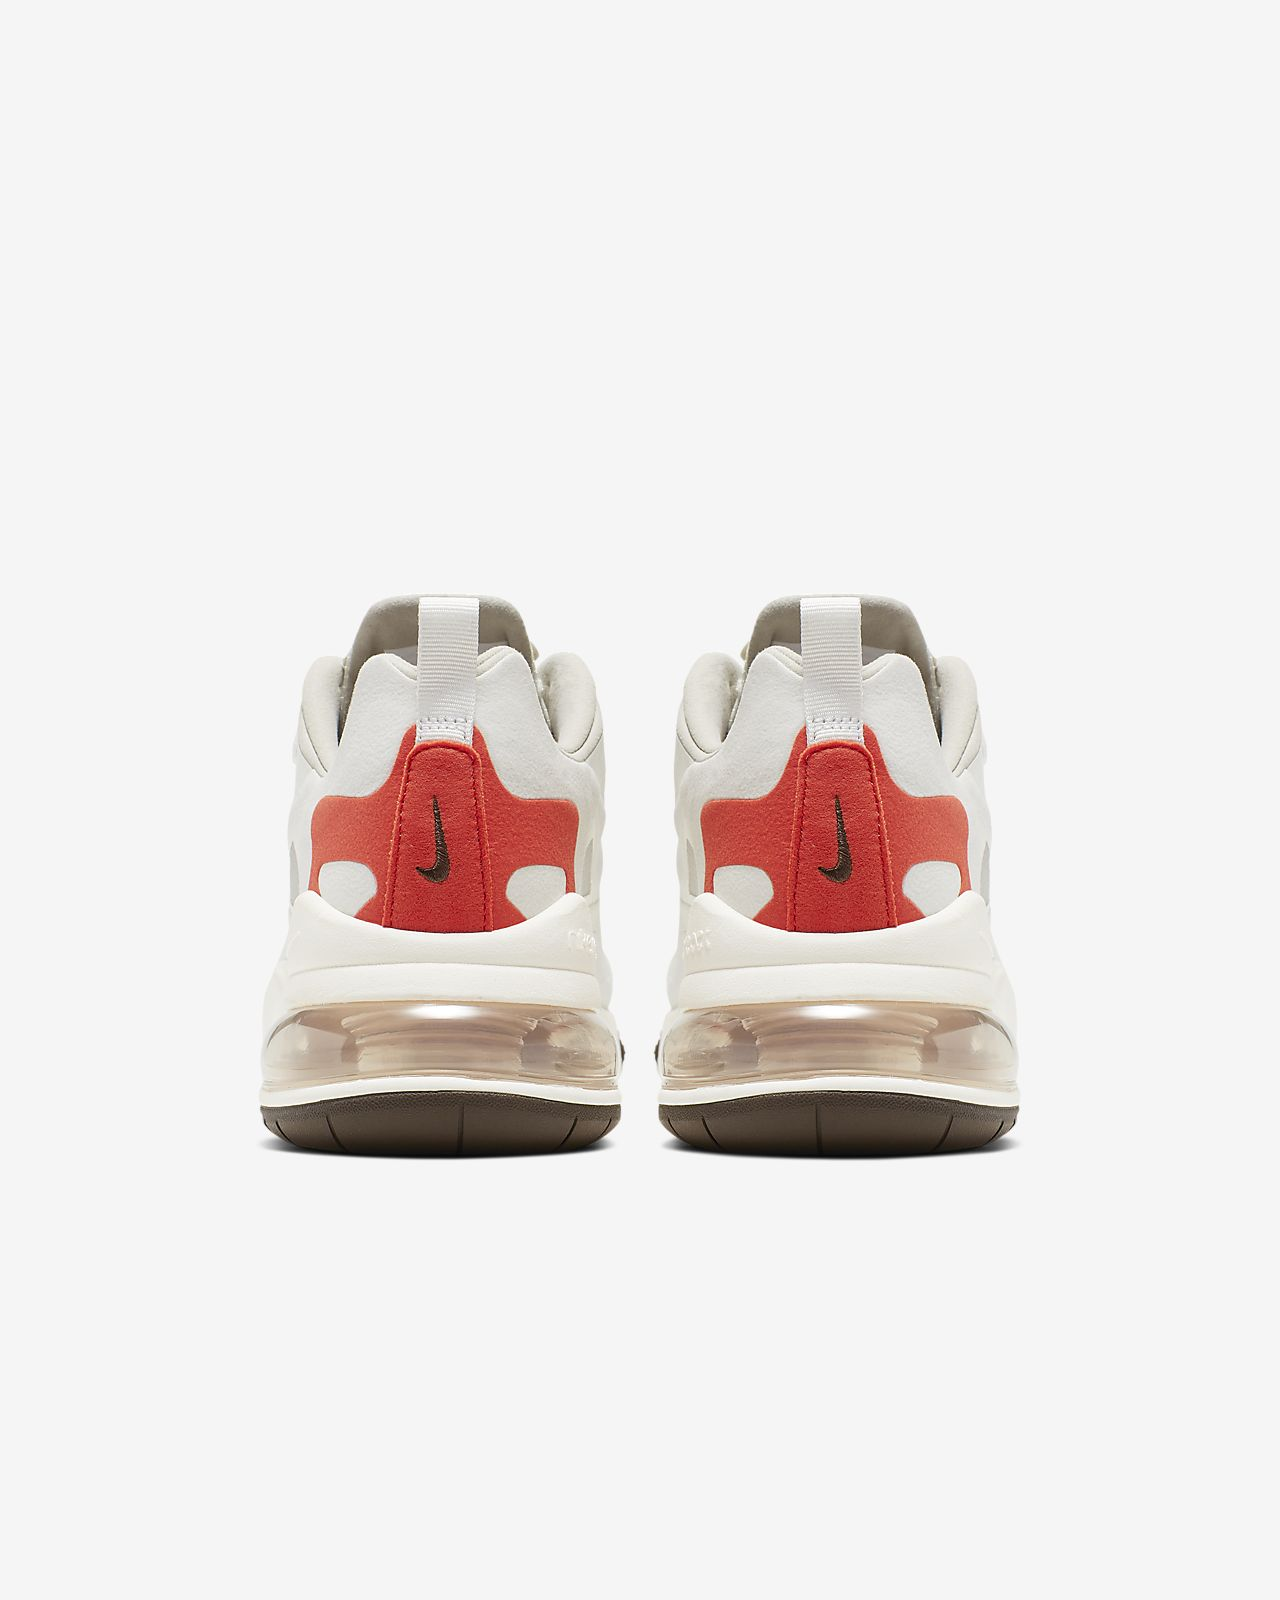 Design Moderne Réductions Femme Nike Air Max 270 Chaussure